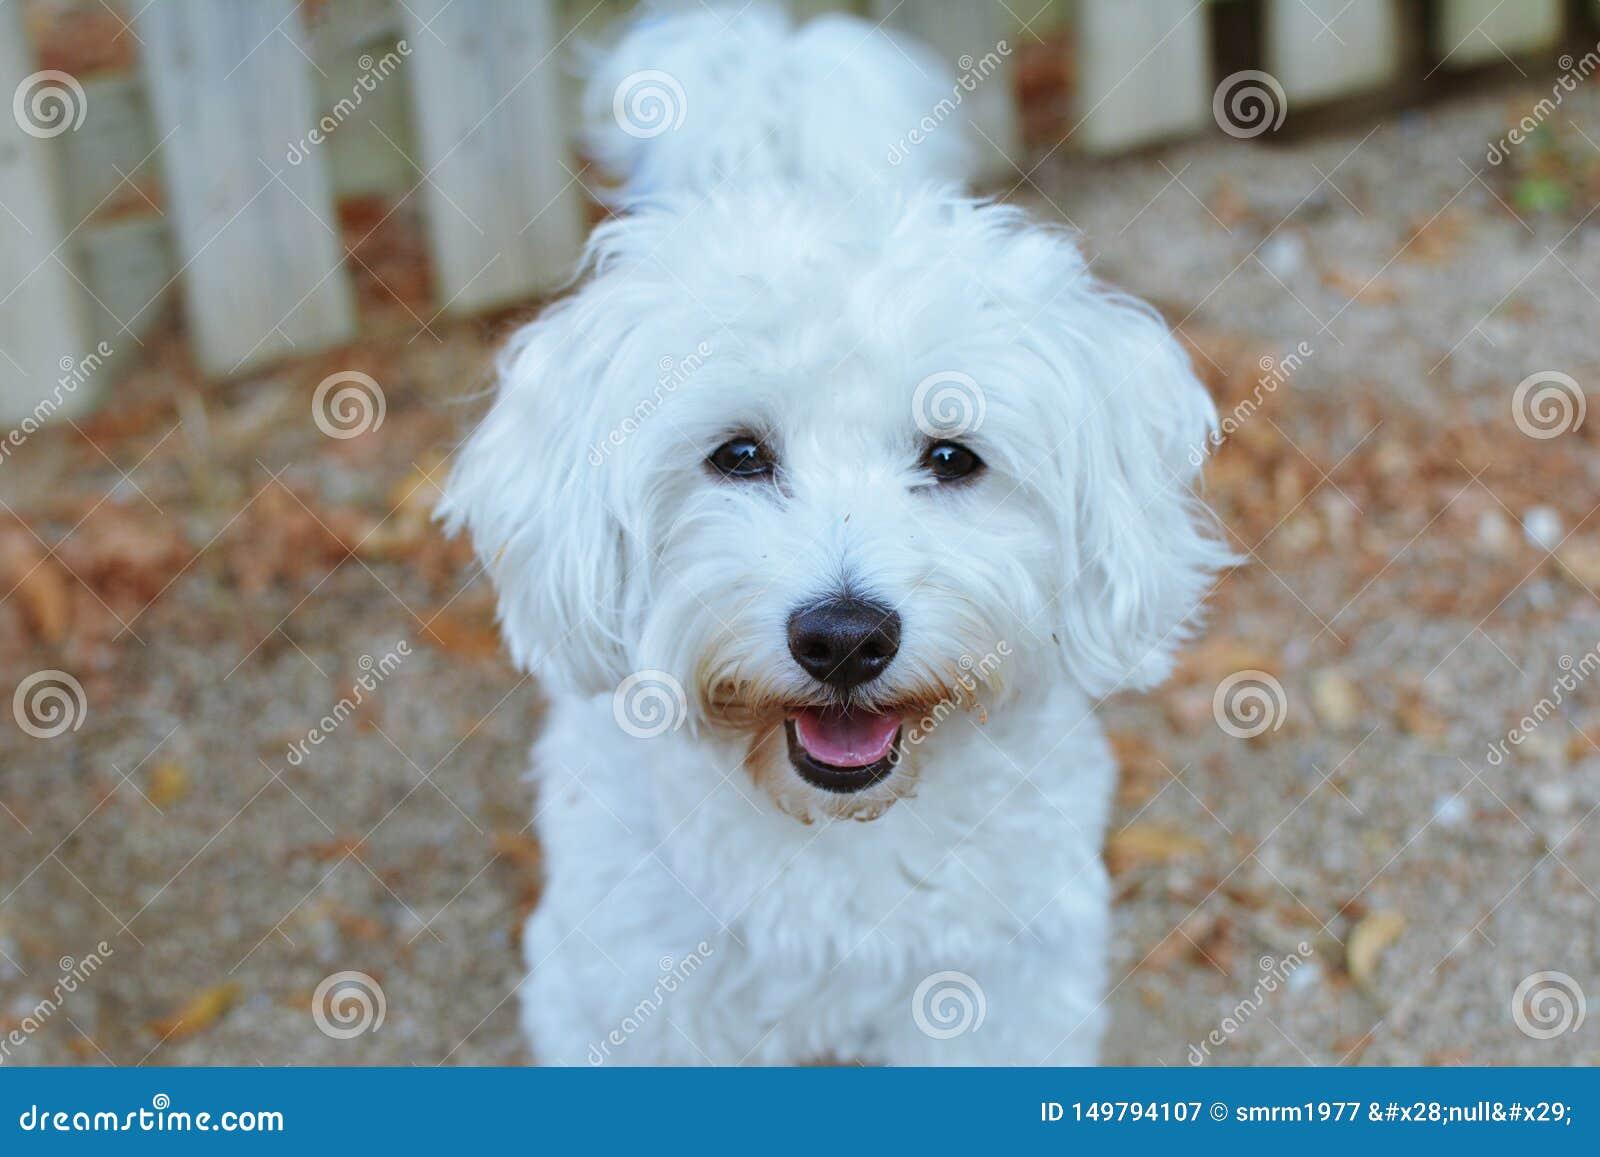 PORTRAIT HAPPY MALTESE DOG AGAINST NEIGHBOURS WOODEN FENCE